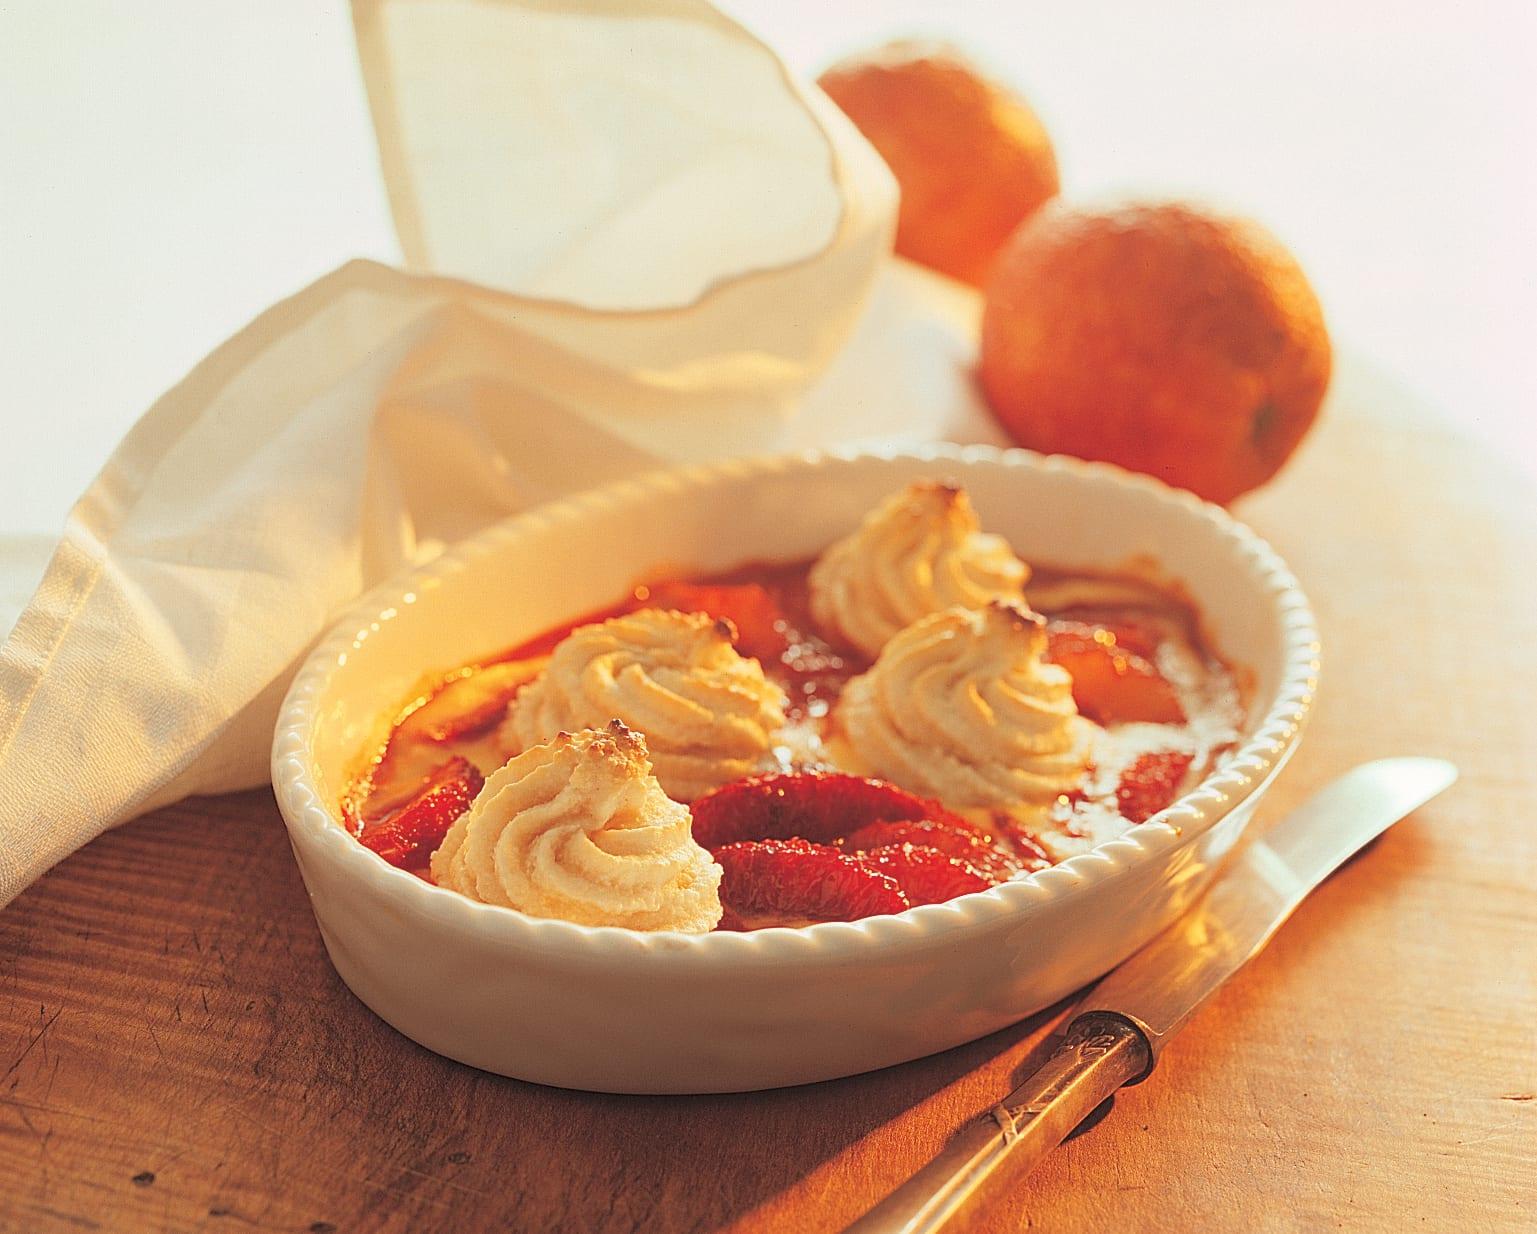 Orangengratin mit Mandelhaube